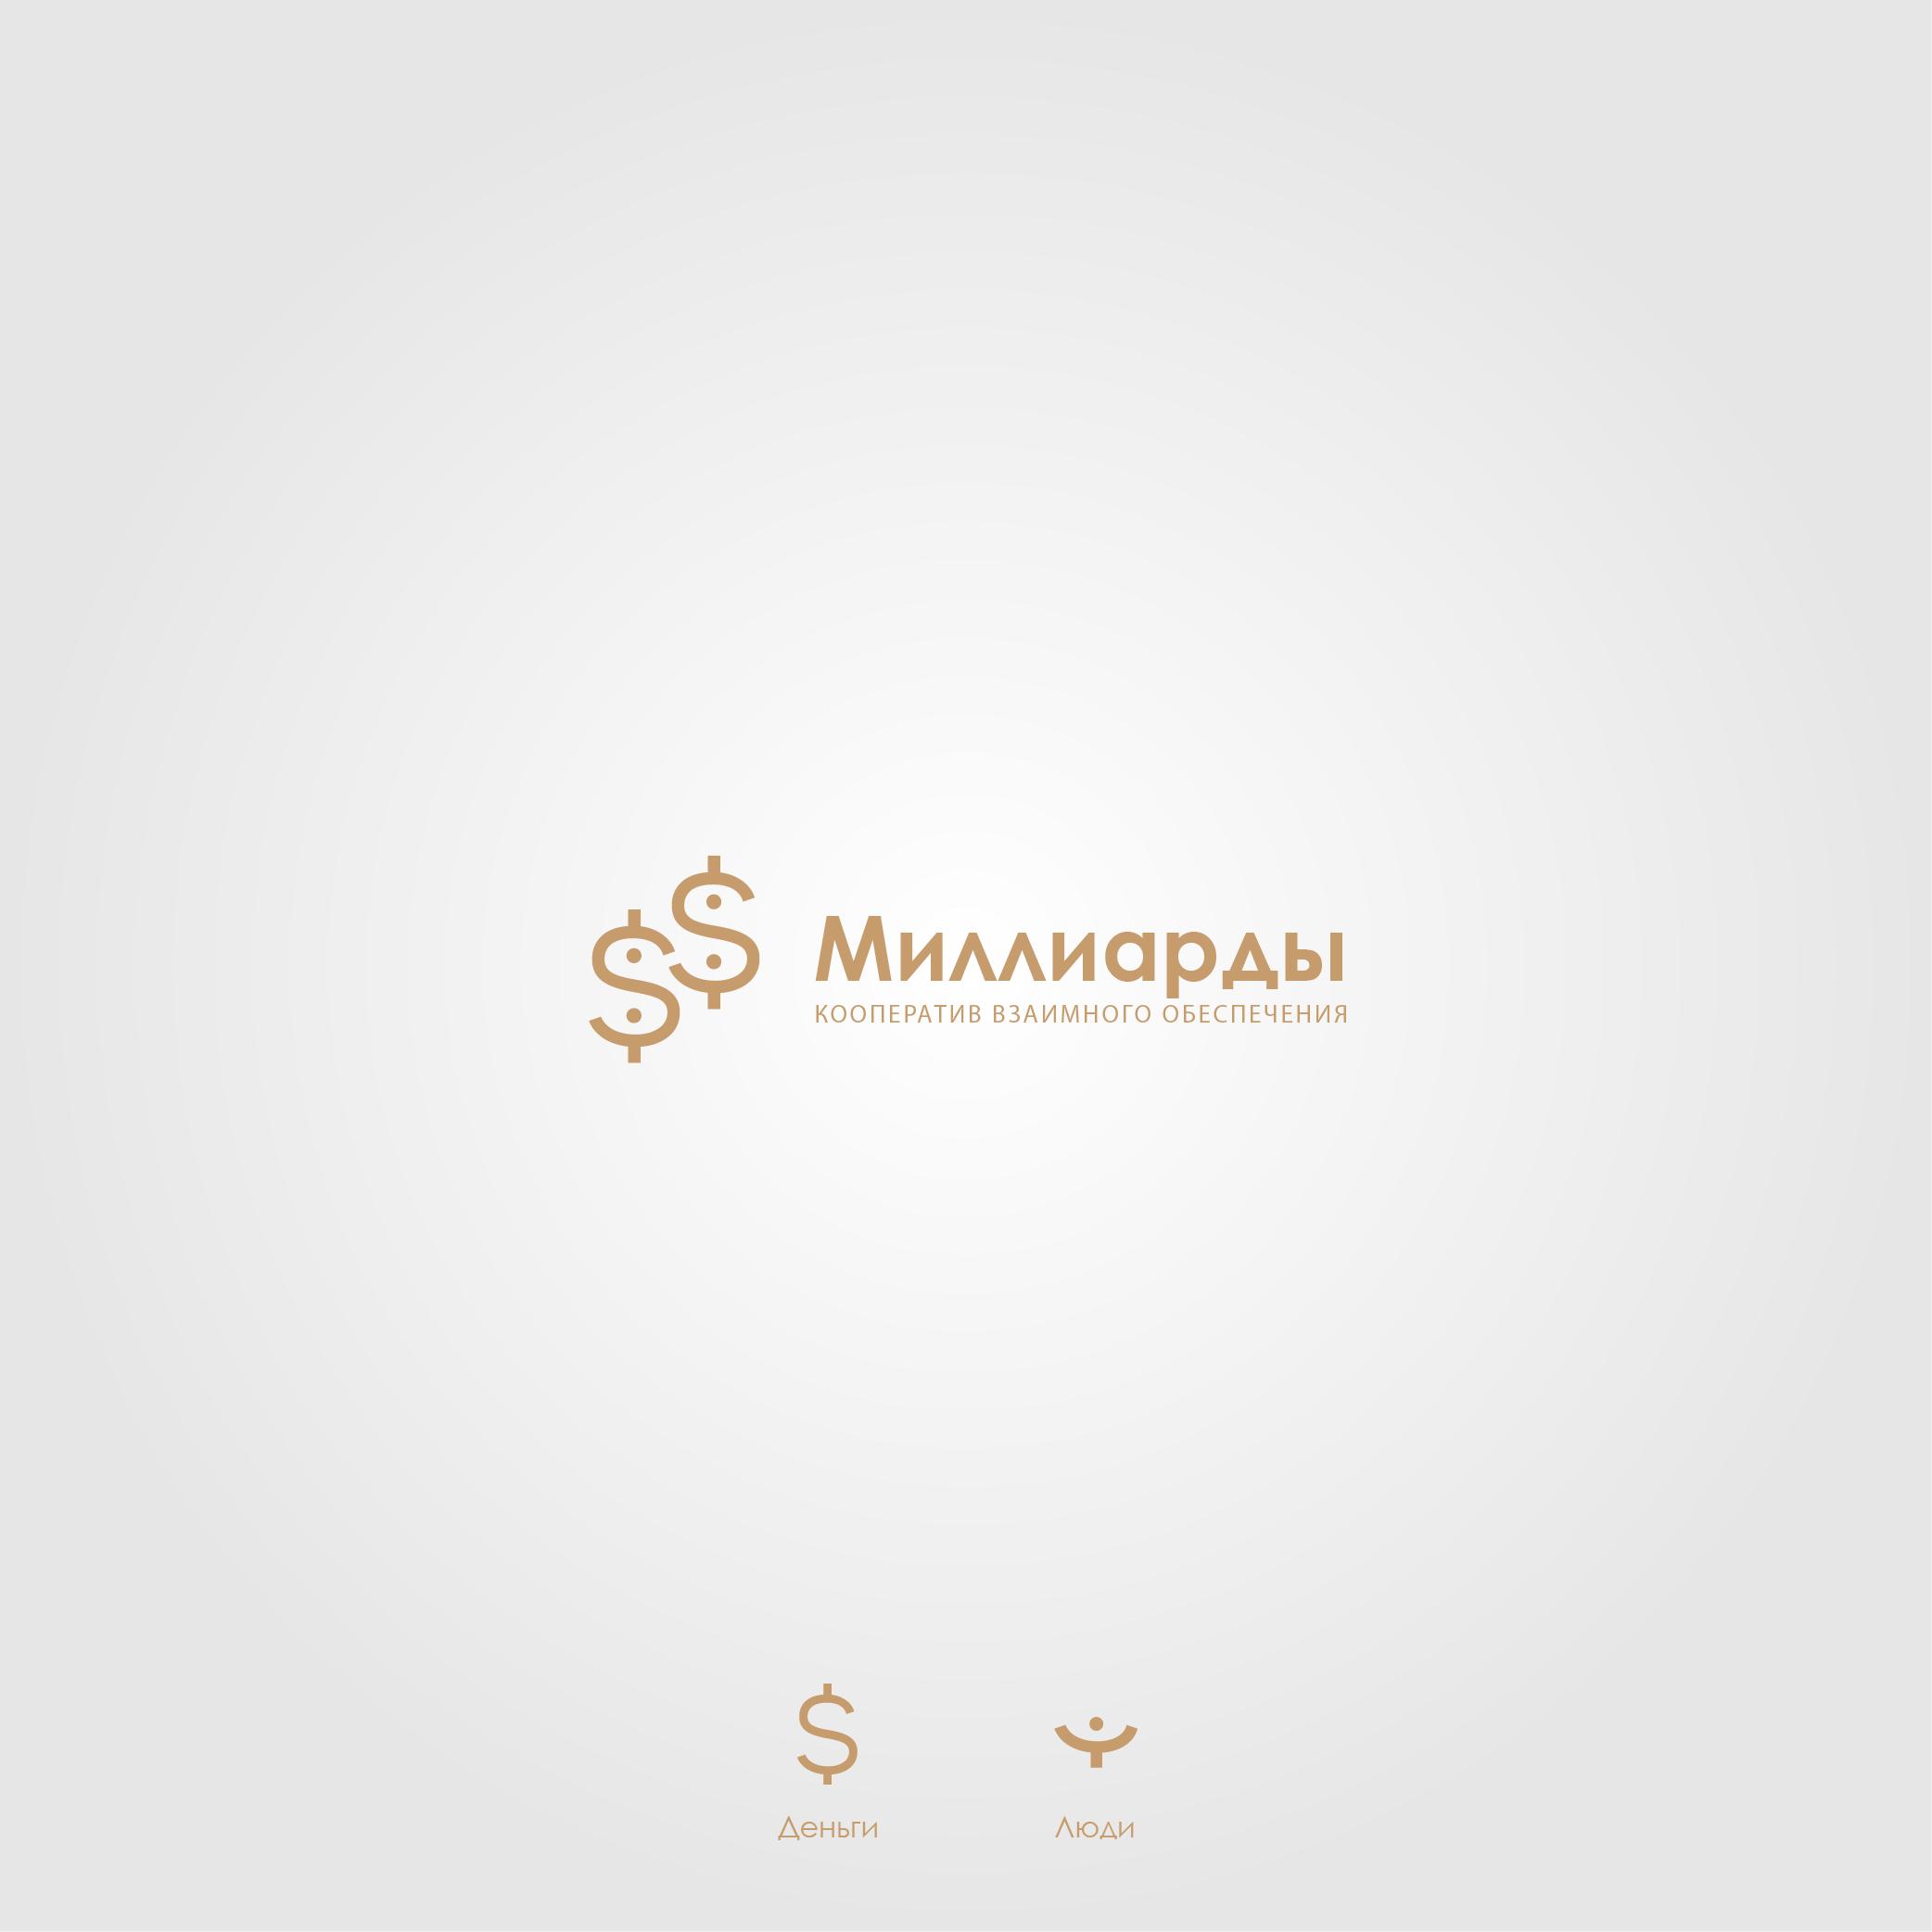 Создание логотипа фото f_5375e3dabab147ed.jpg